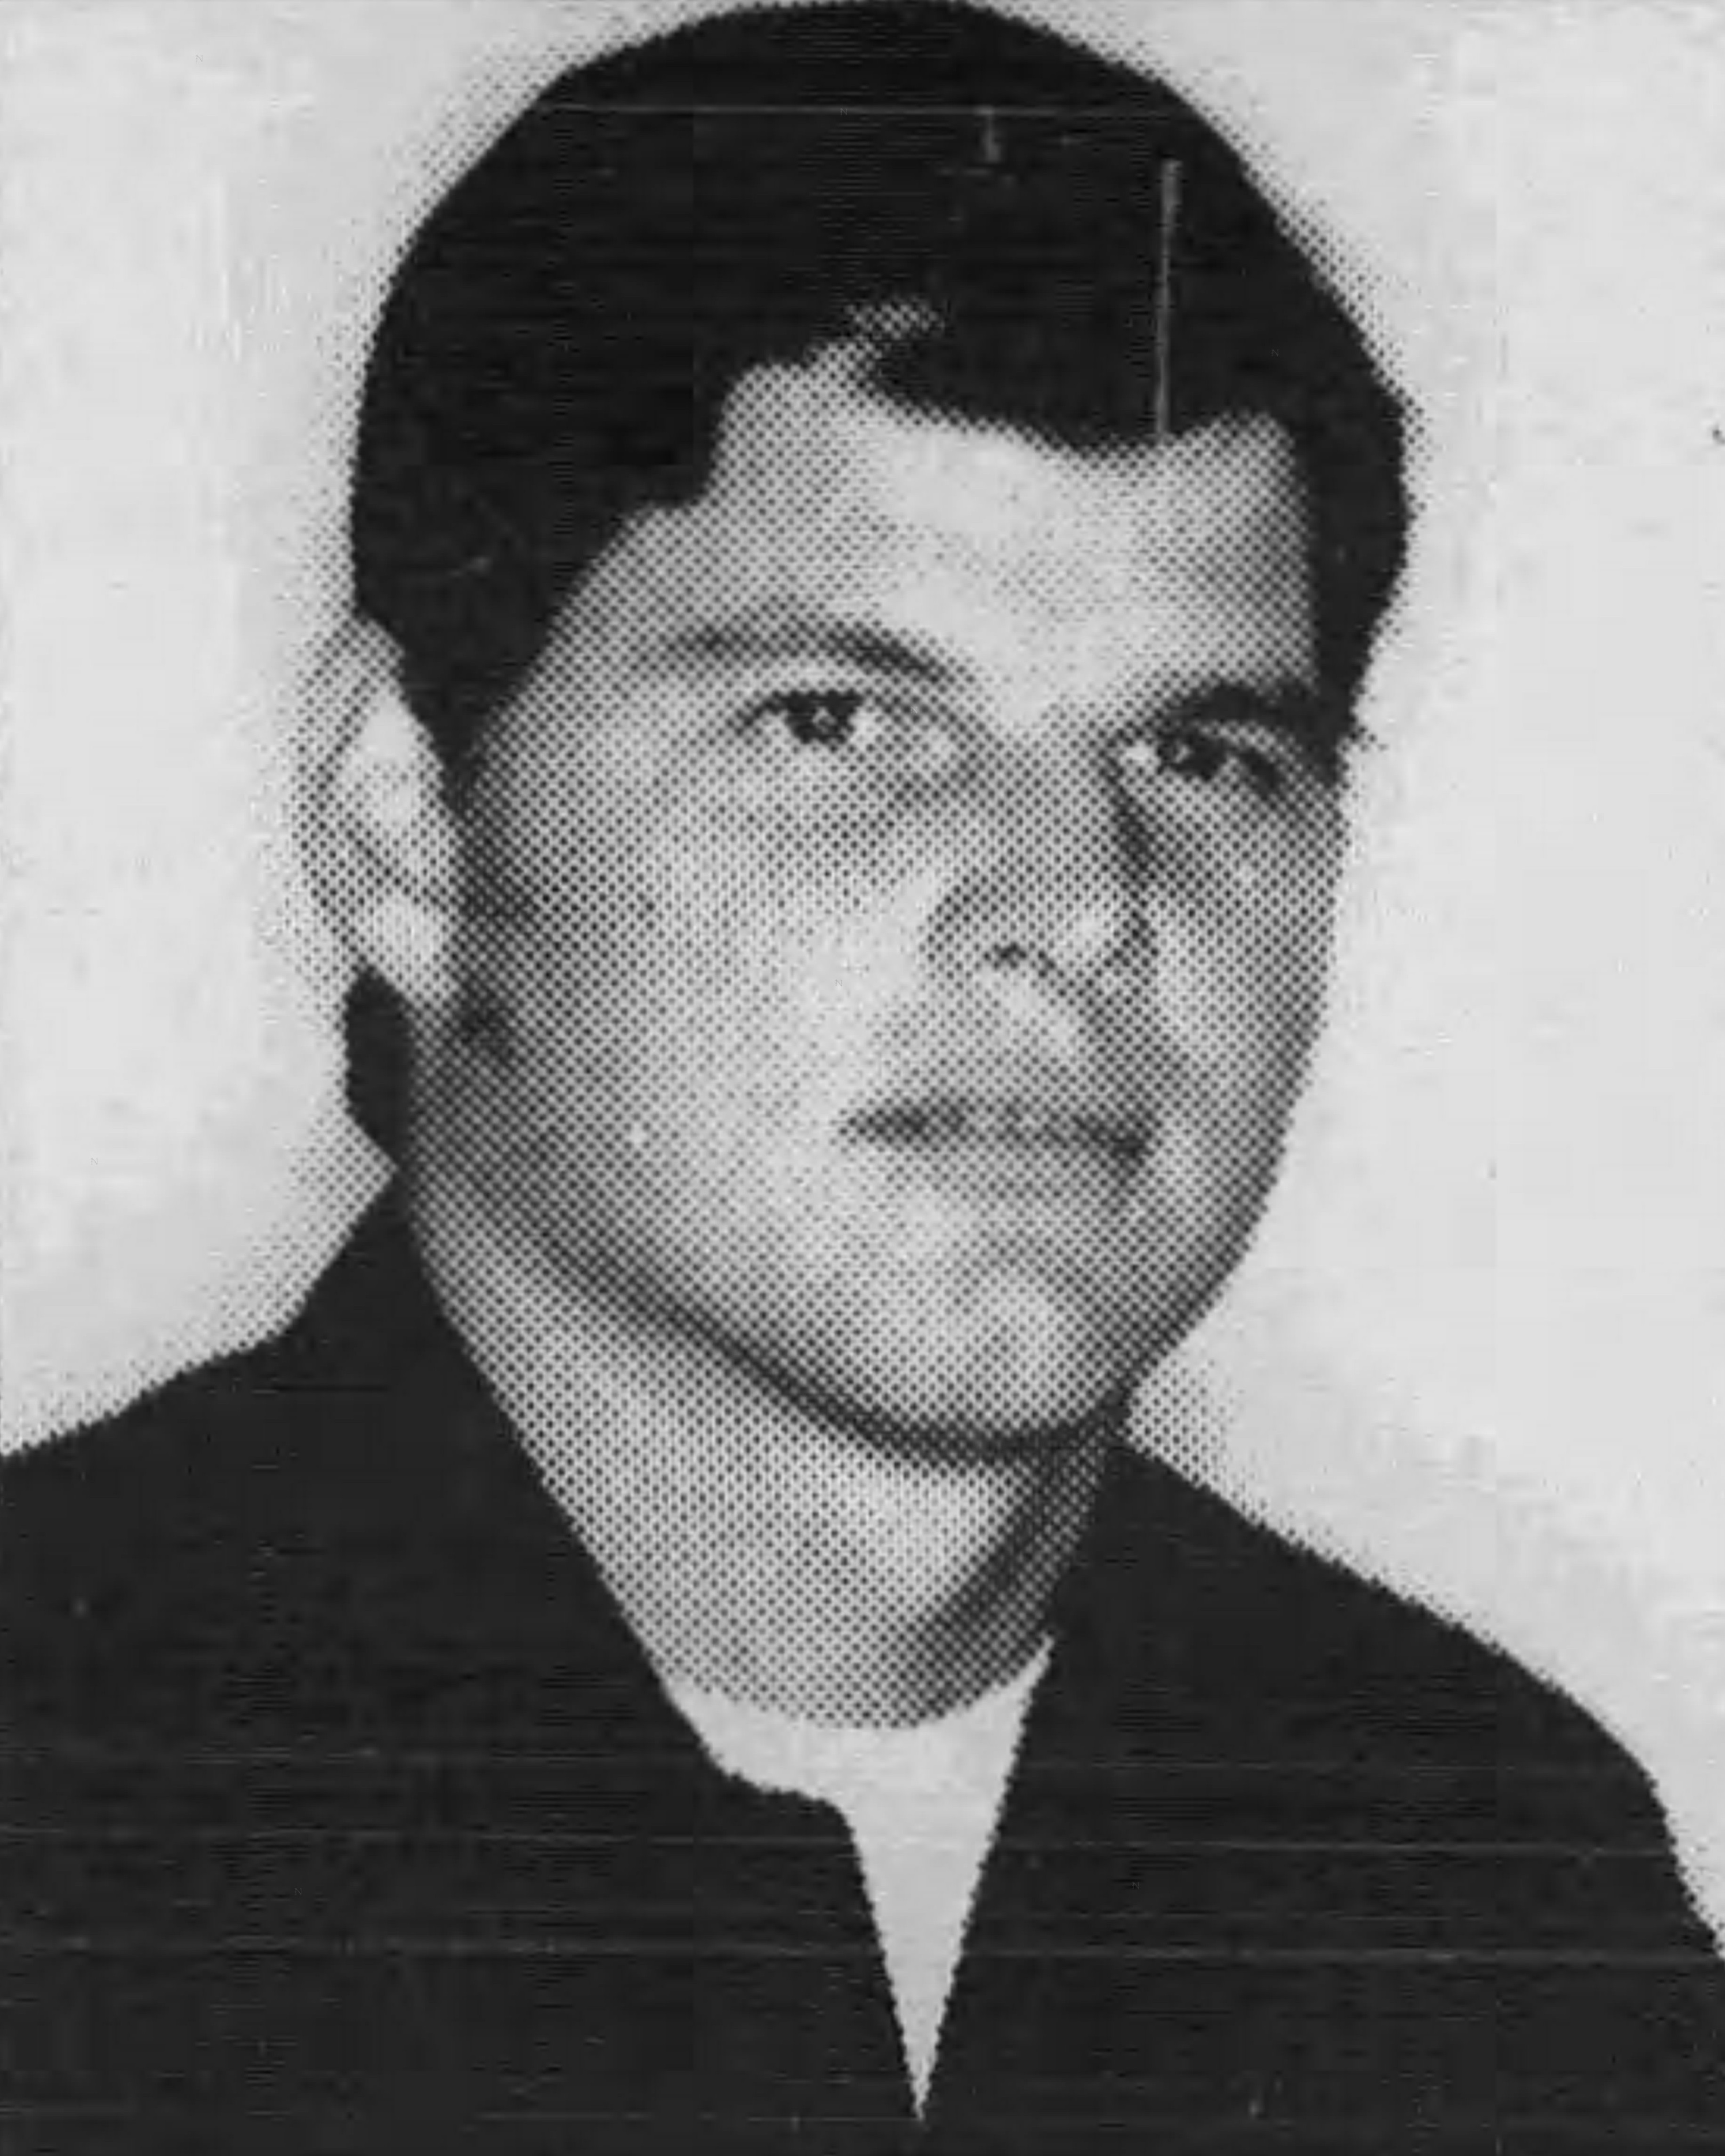 Police Officer James David Ketchum | Costa Mesa Police Department, California